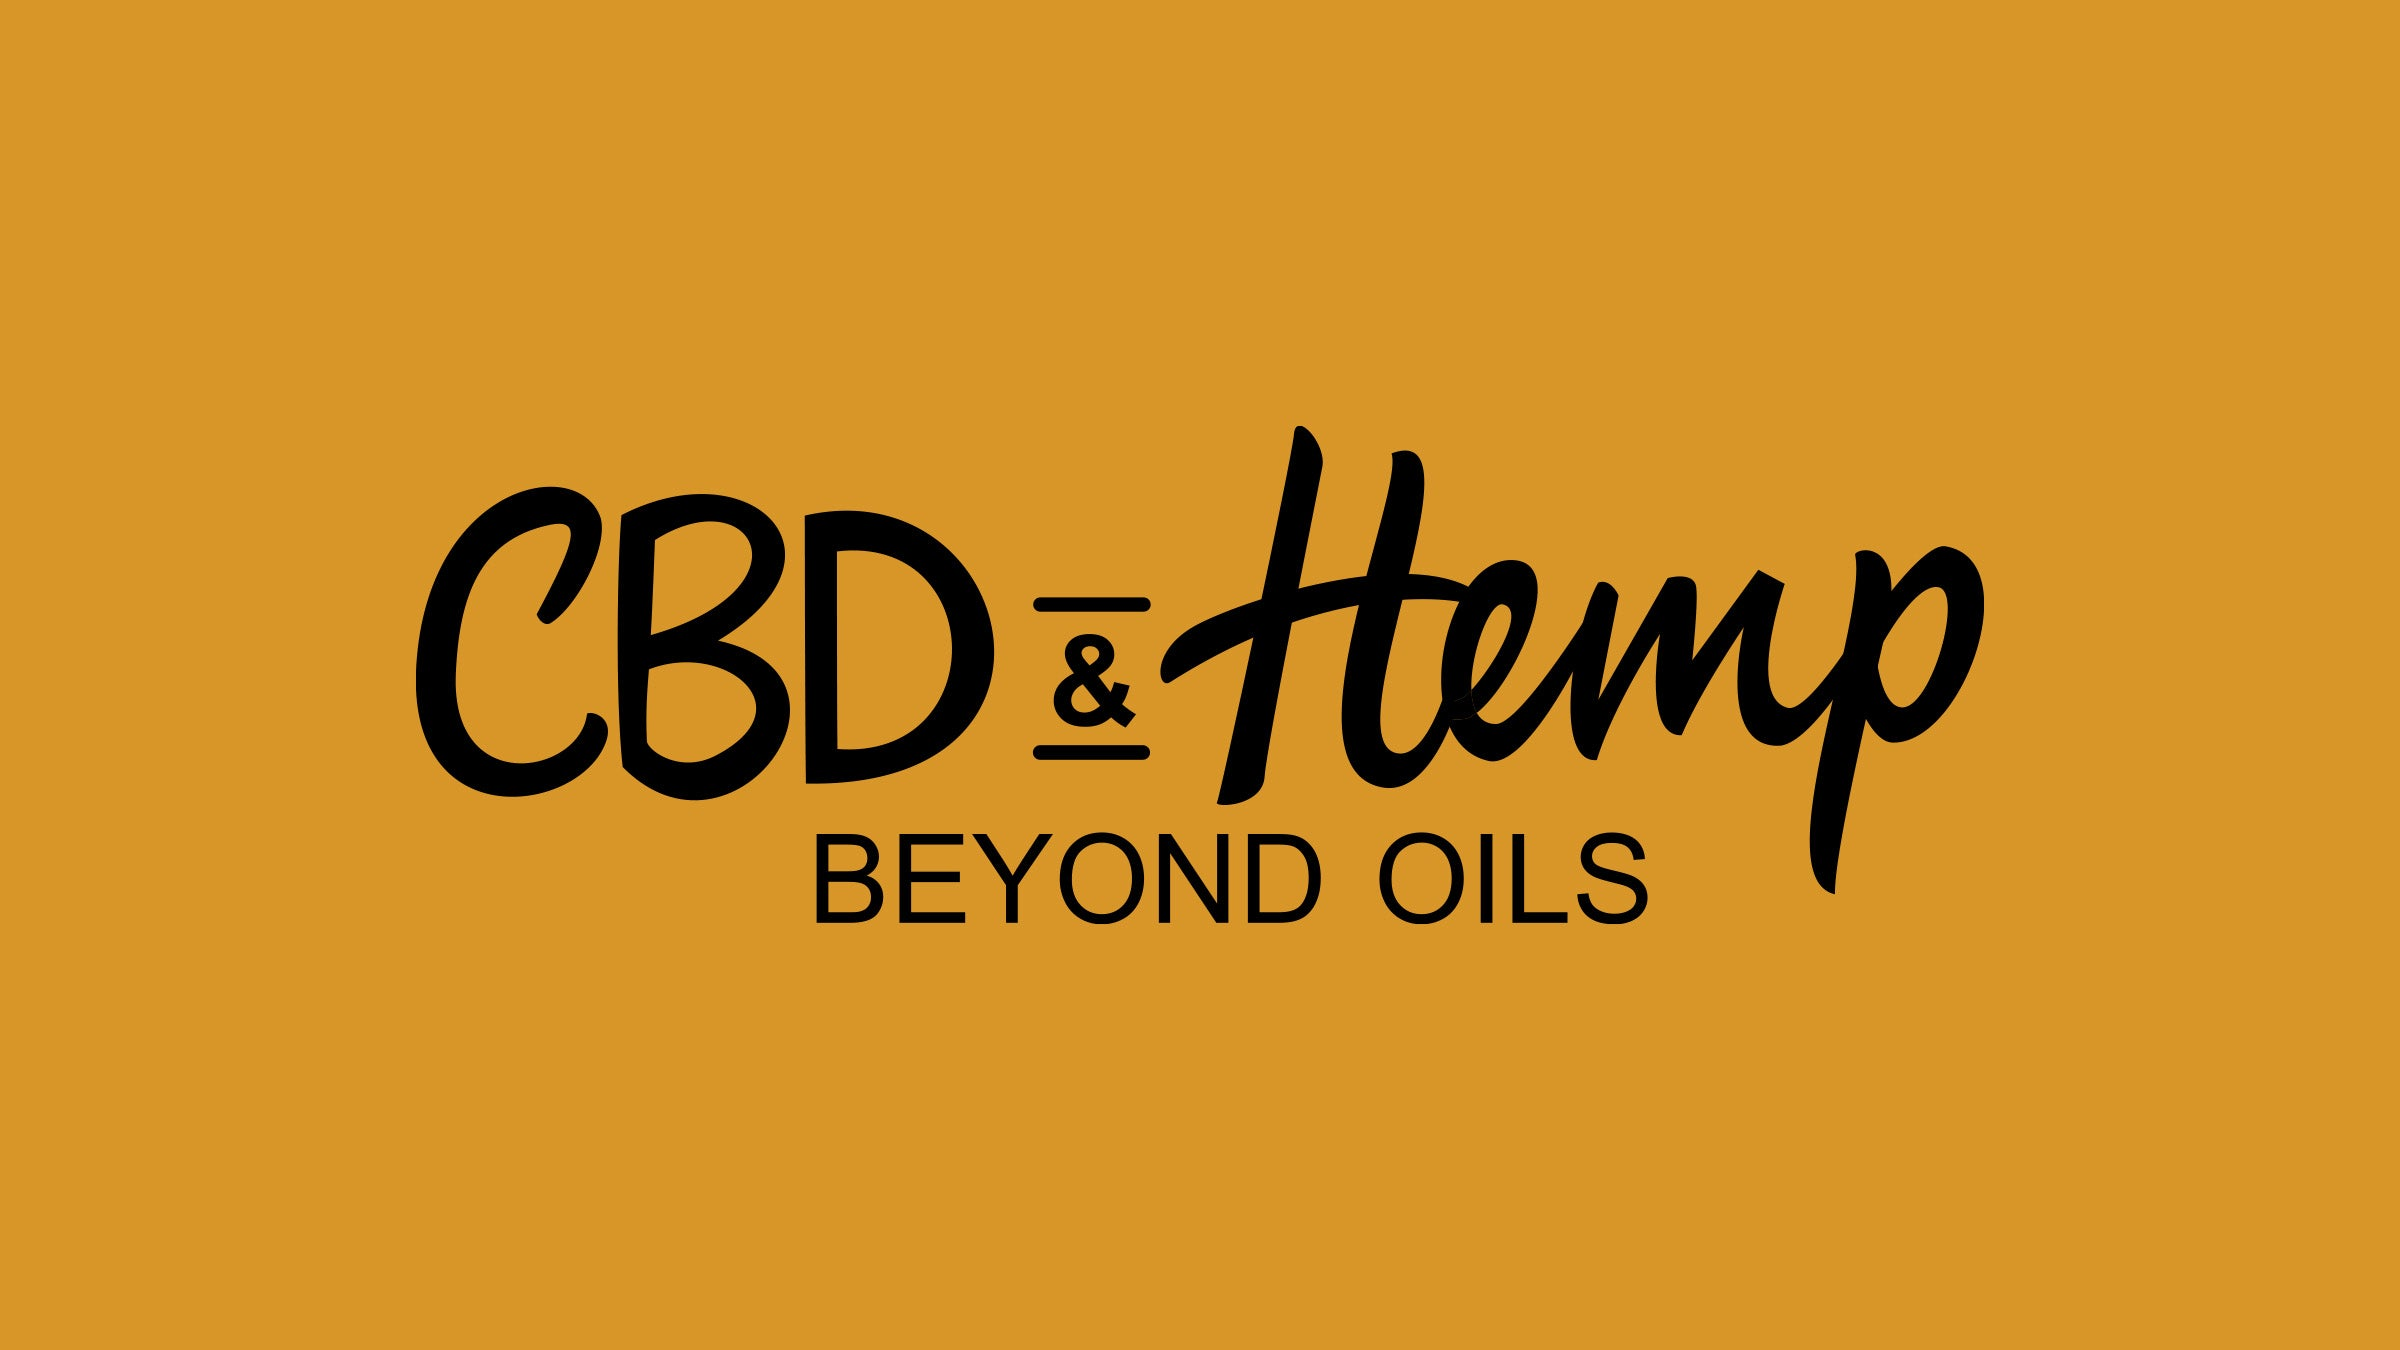 CBD & Hemp: Beyond Oils